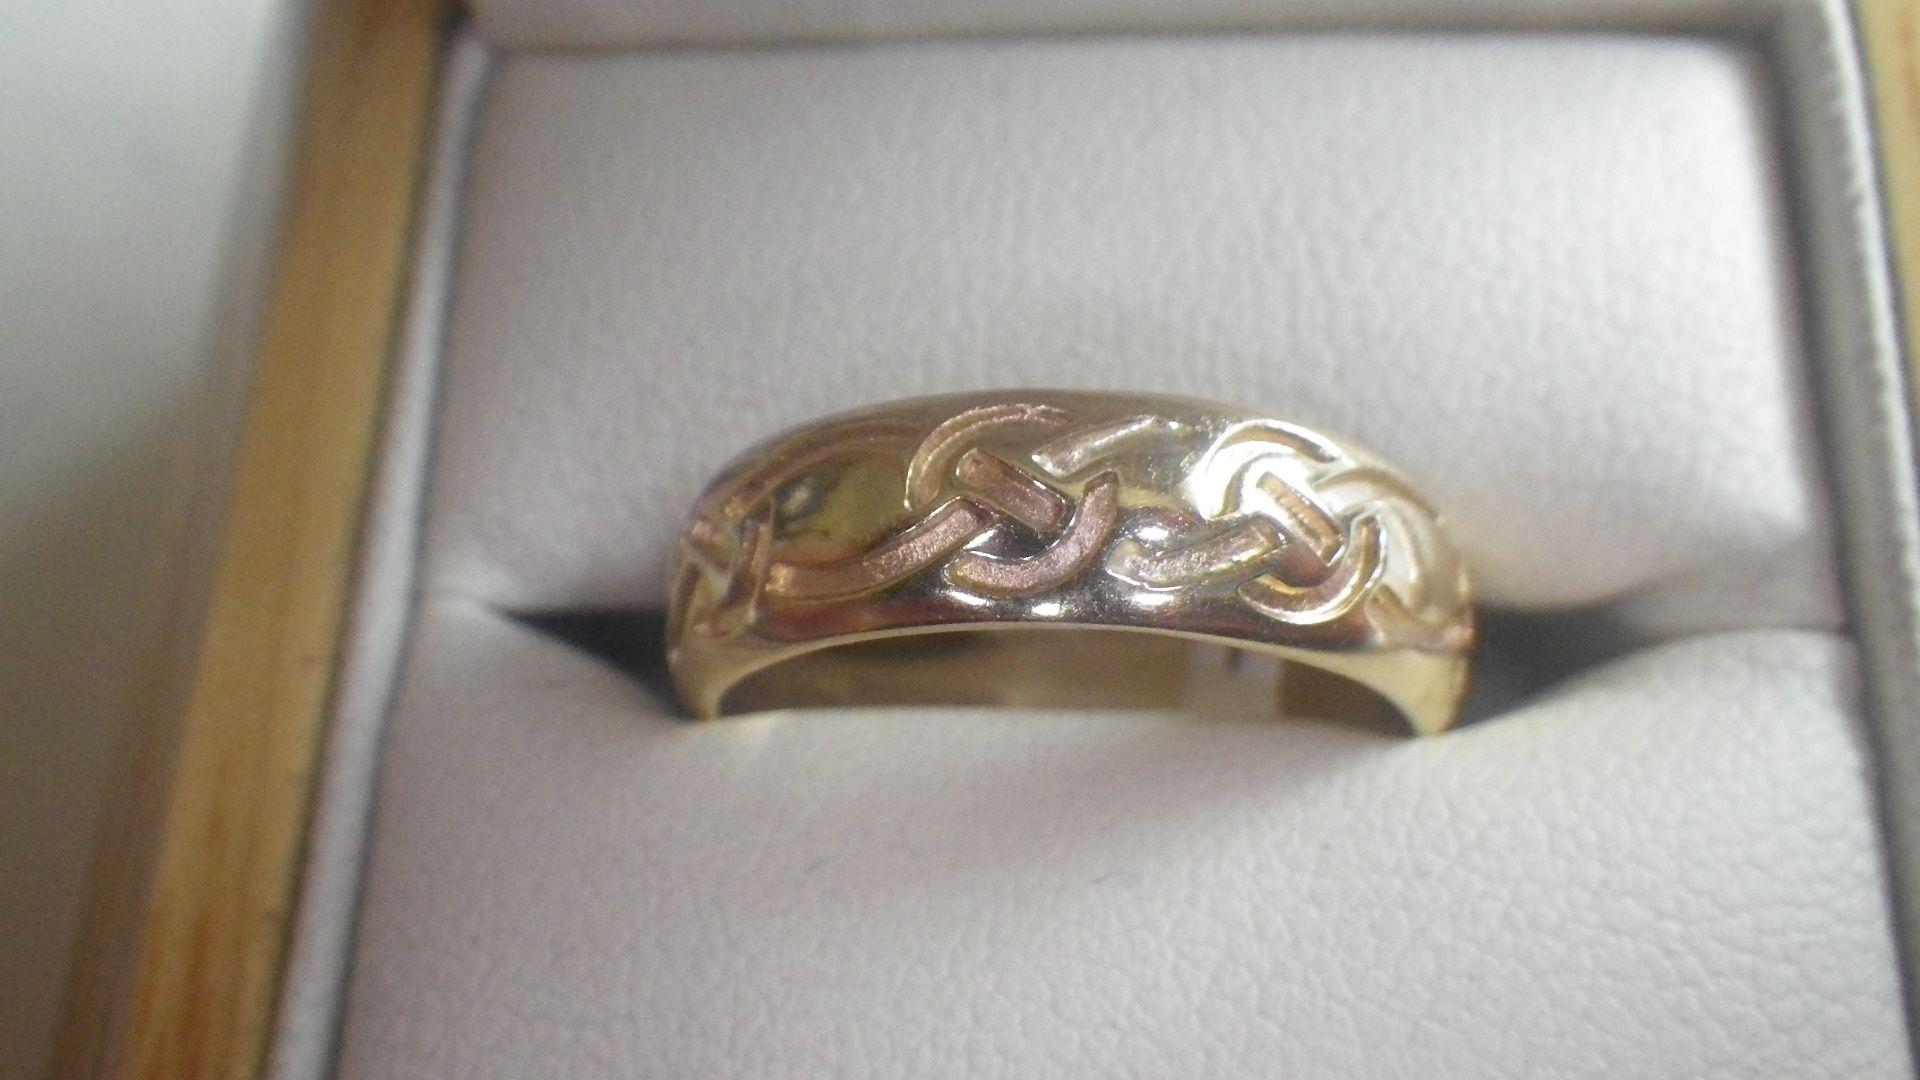 Cymru Metal Welsh Gold Celtic Wedding Band Ring GBP295